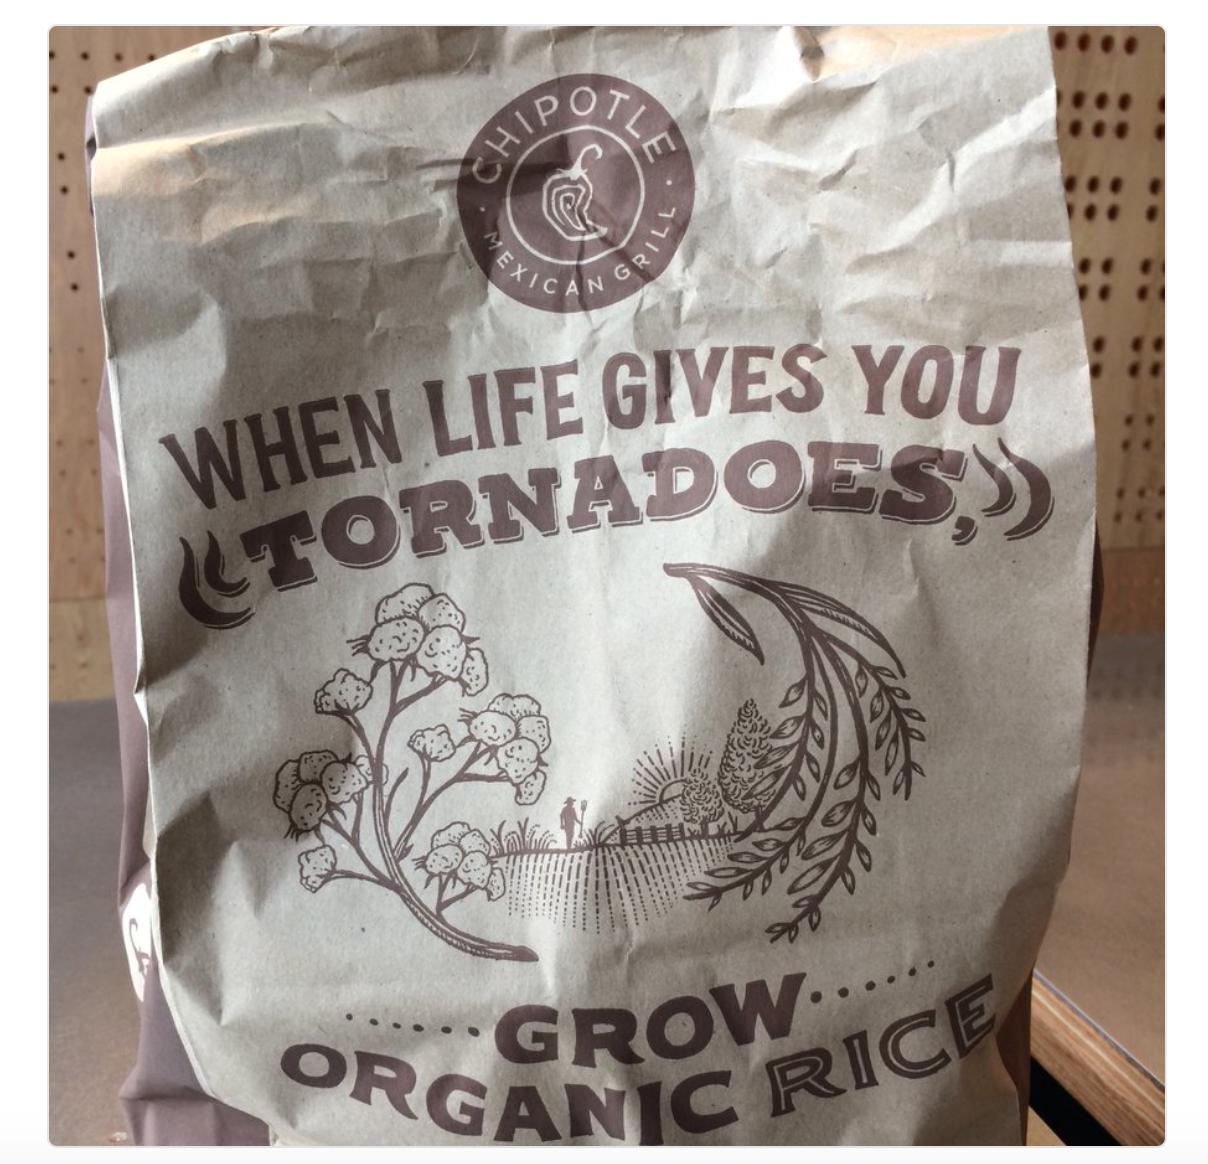 Grow Organic Rice